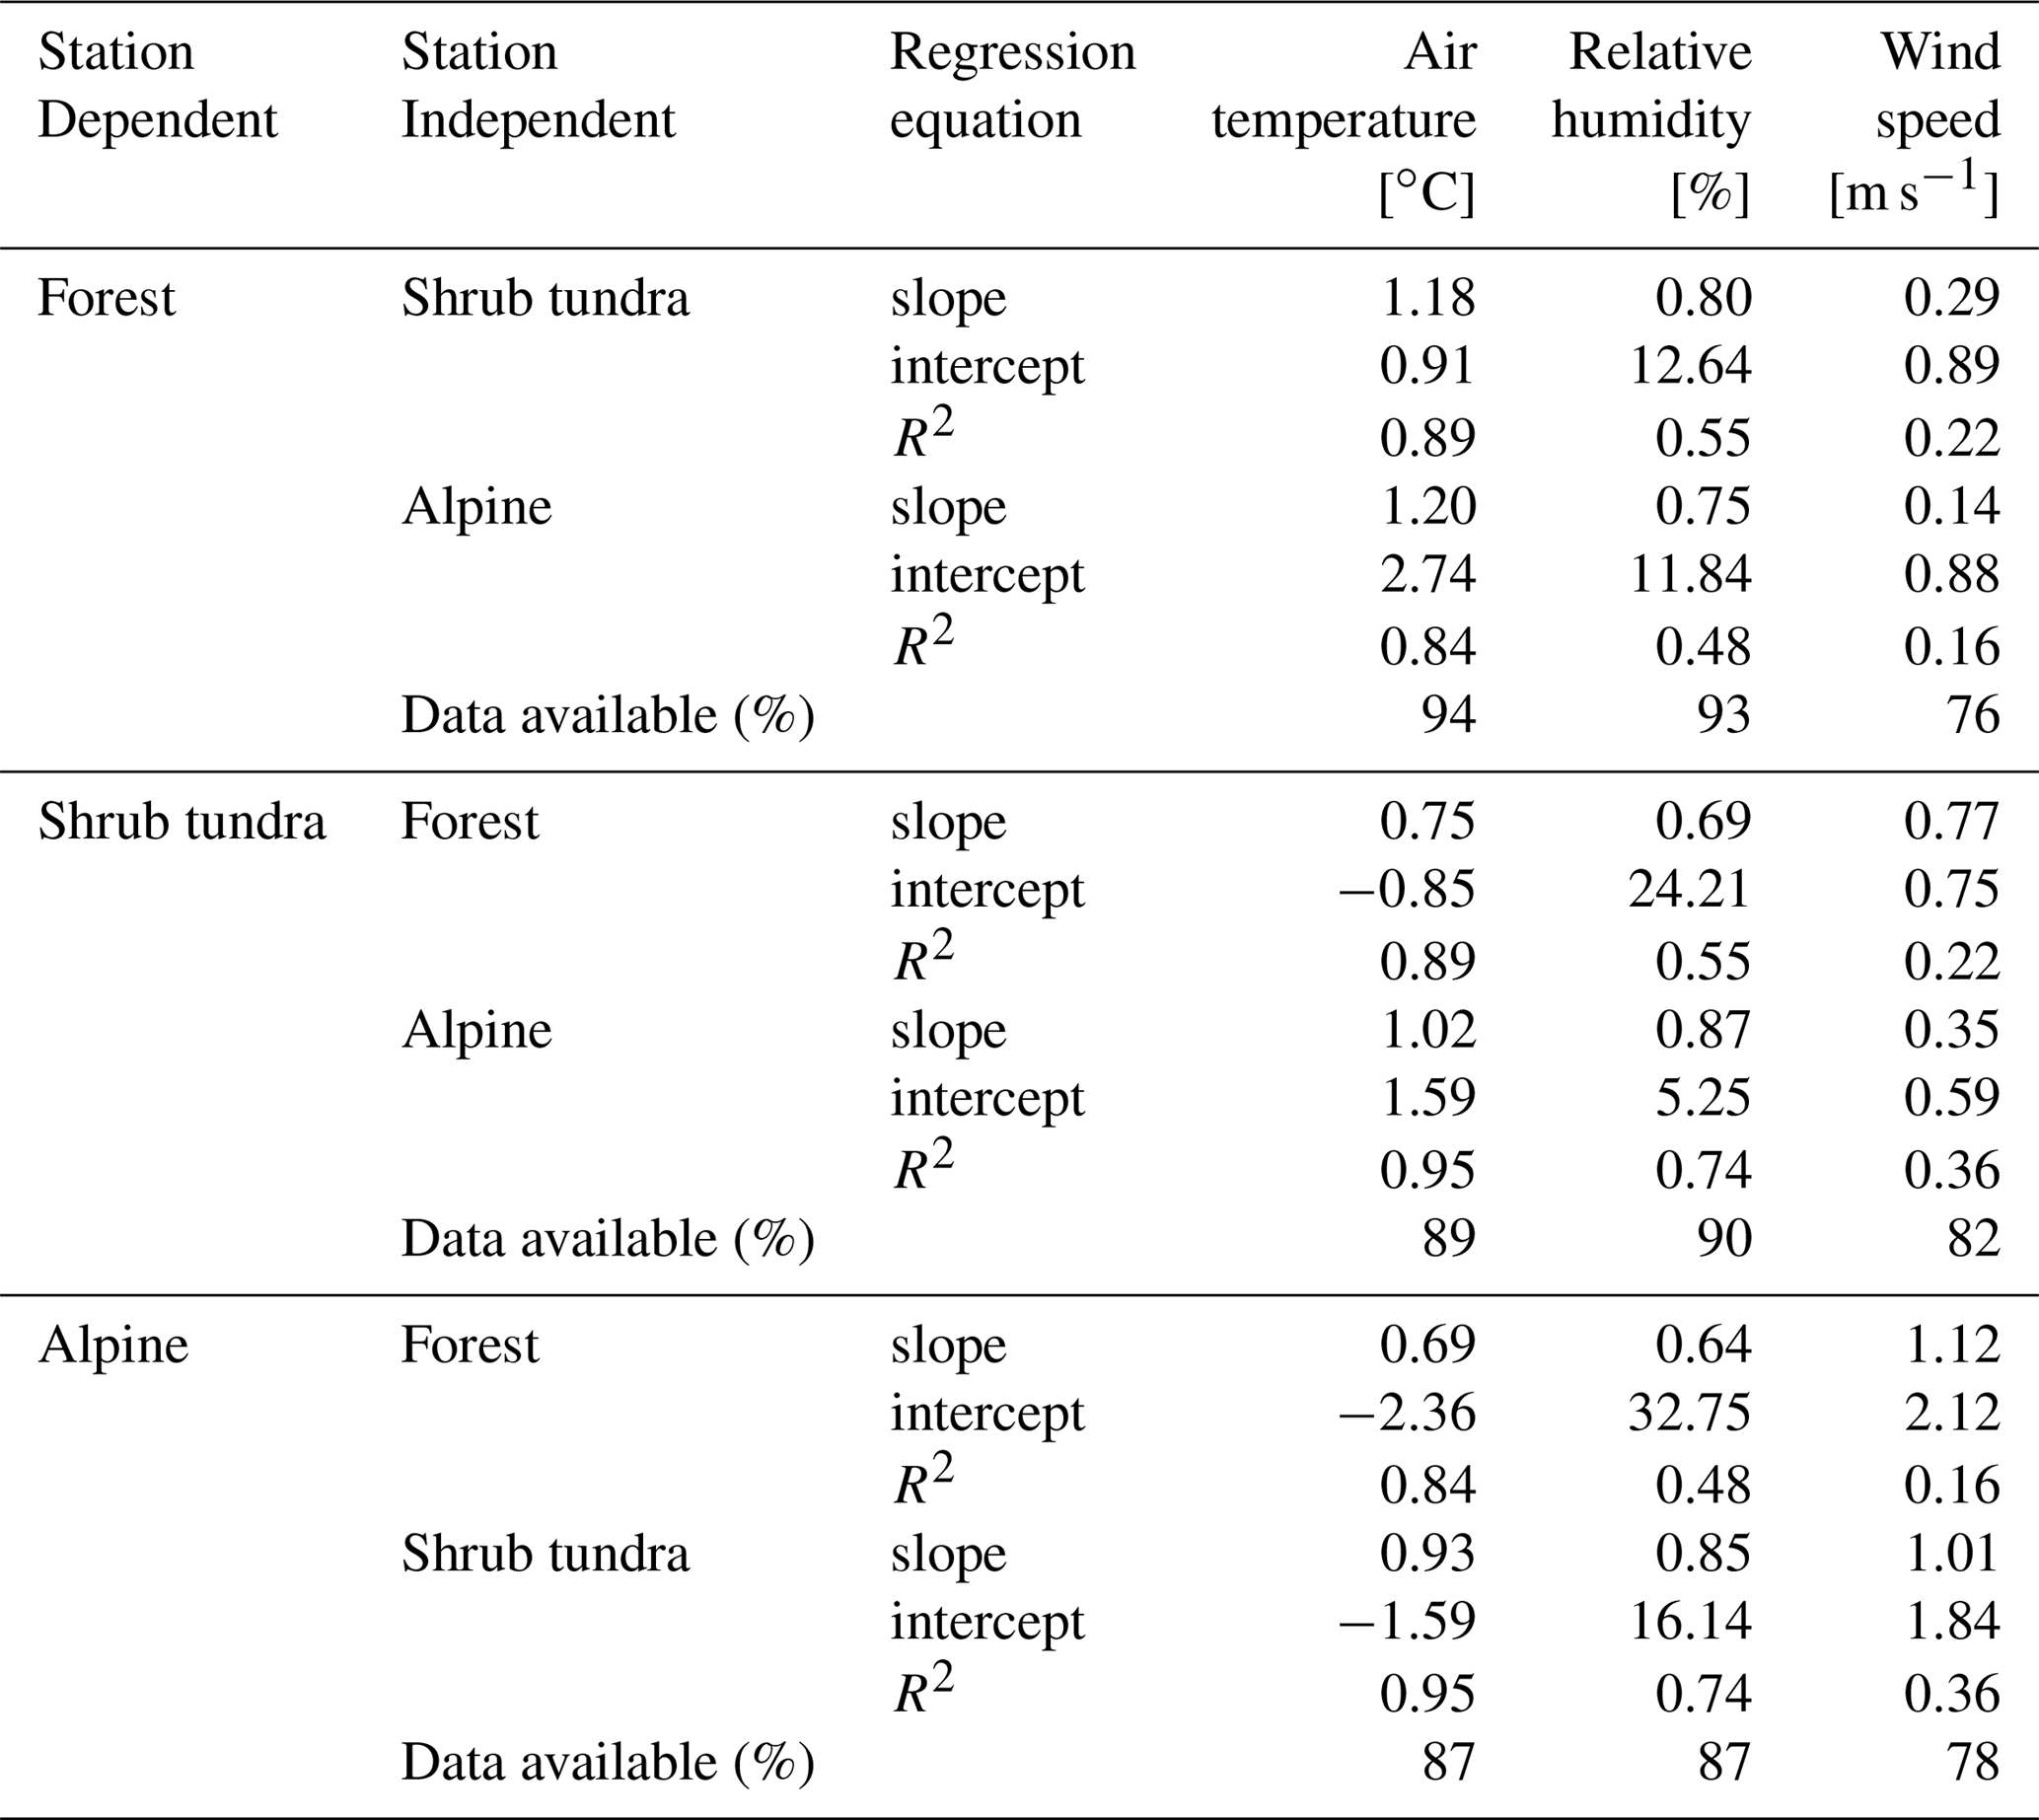 ESSD - A long-term hydrometeorological dataset (1993–2014